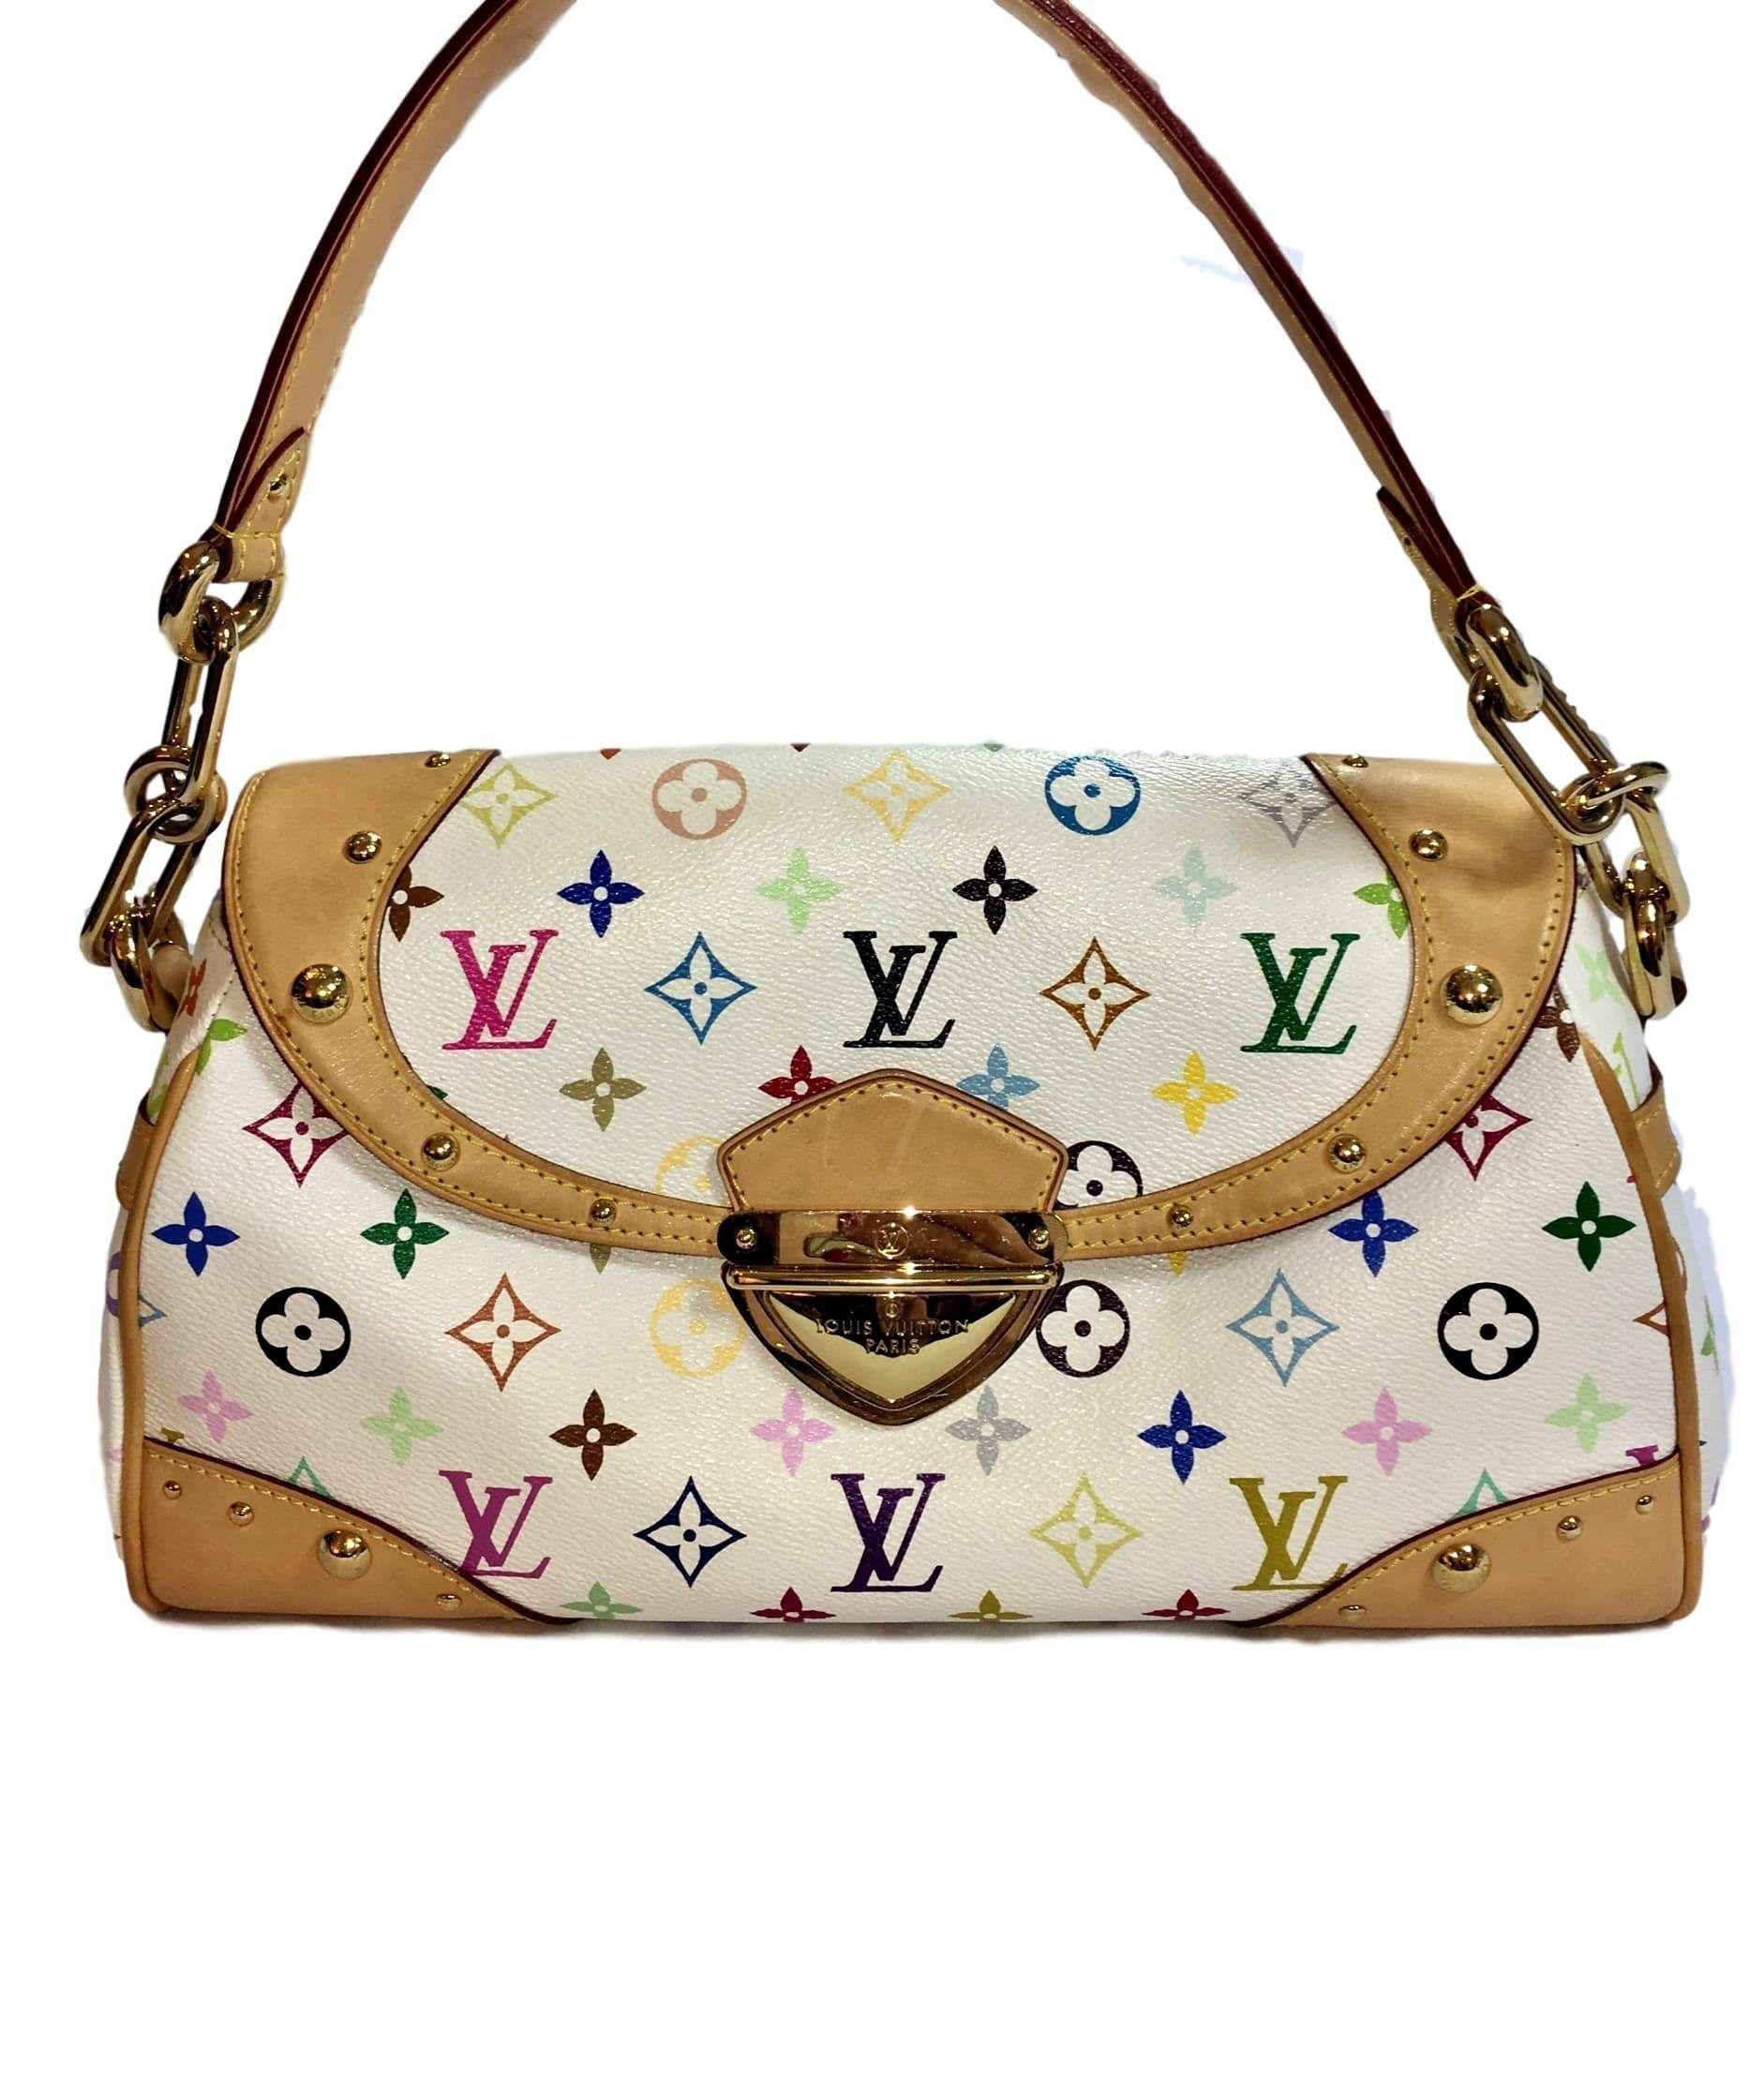 Louis Vuitton Multicolore Monogram MM bag. Very Chic